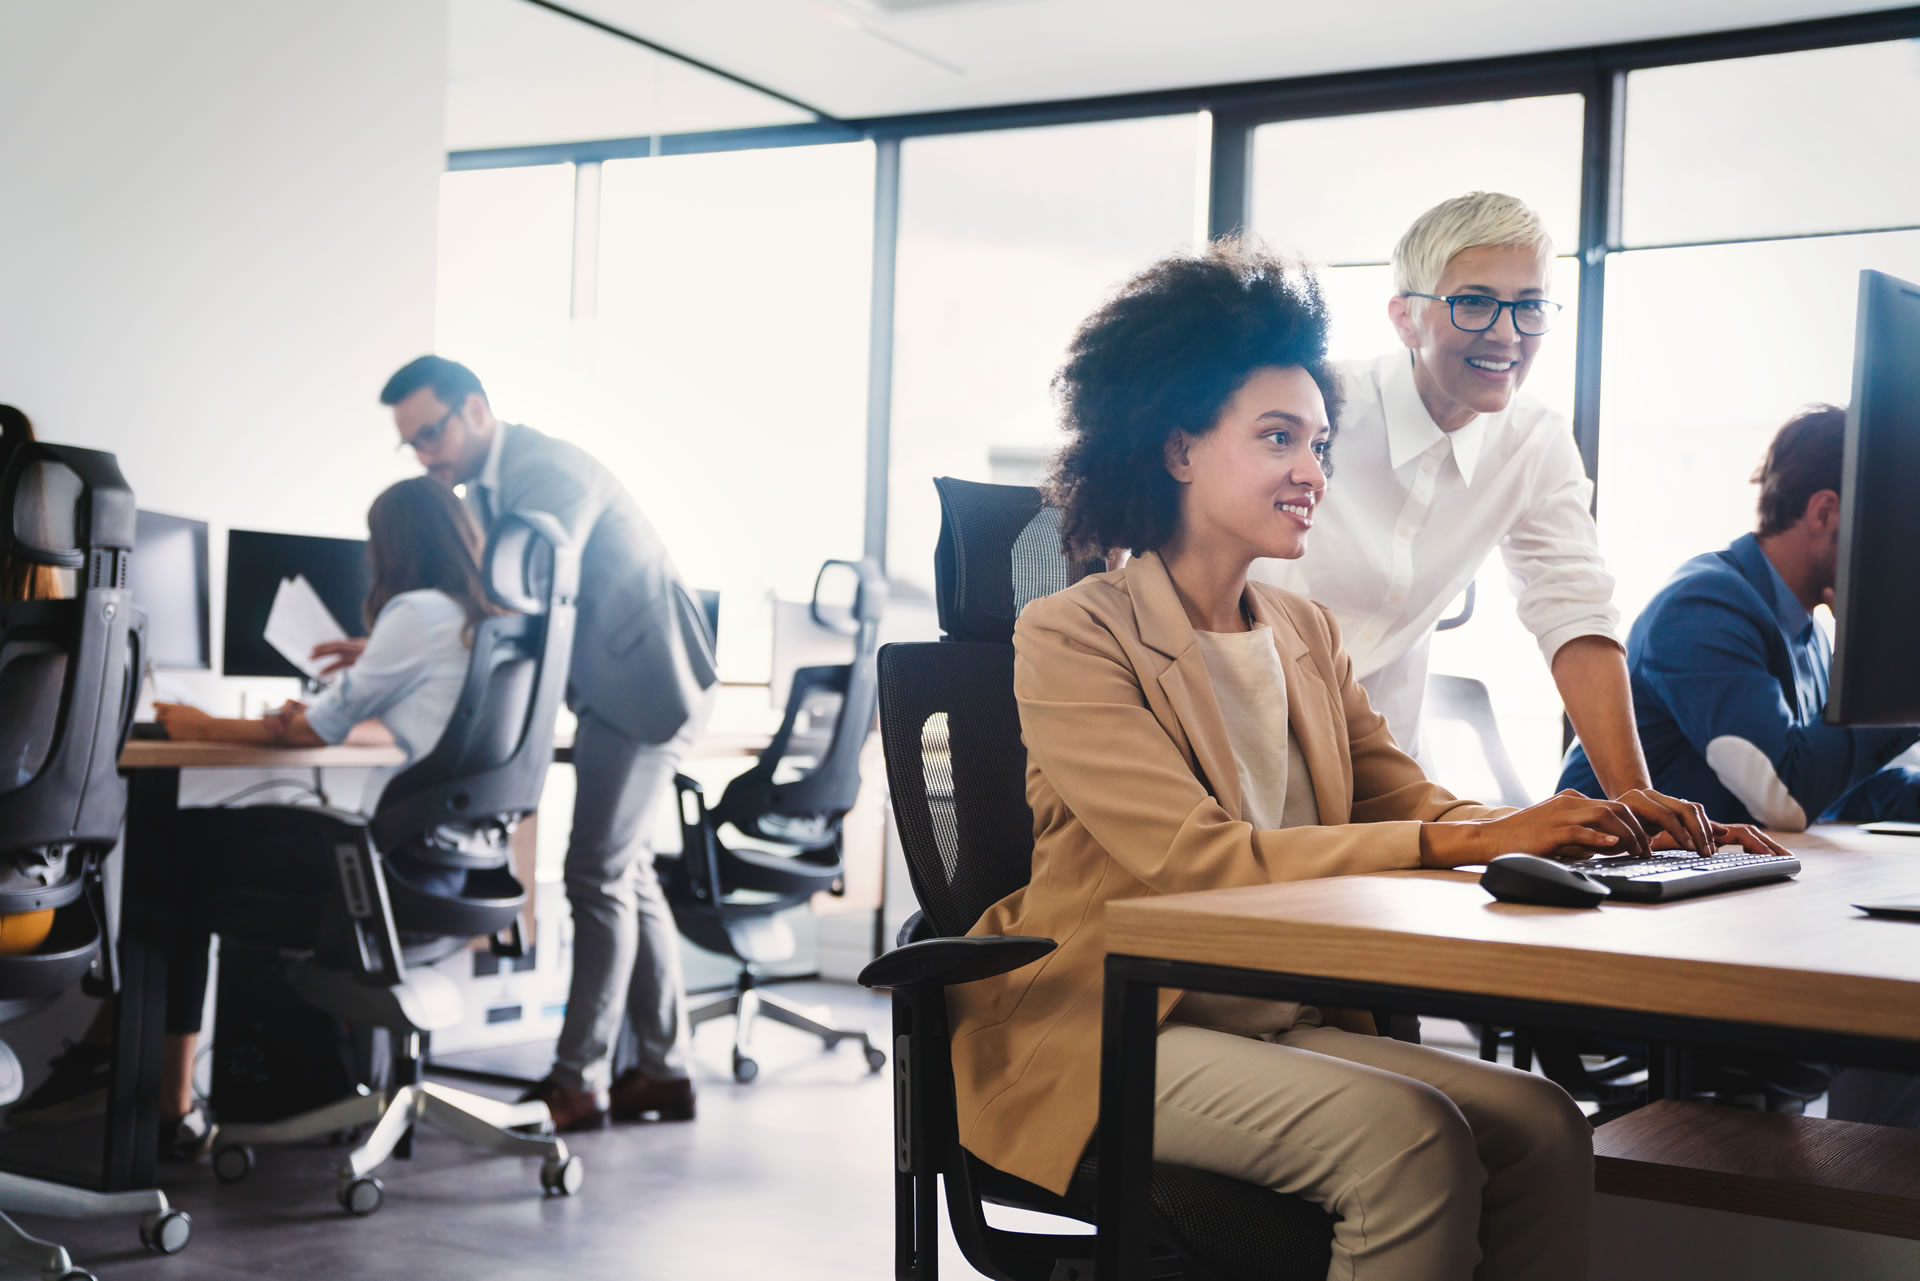 7 benefits of diversity at work